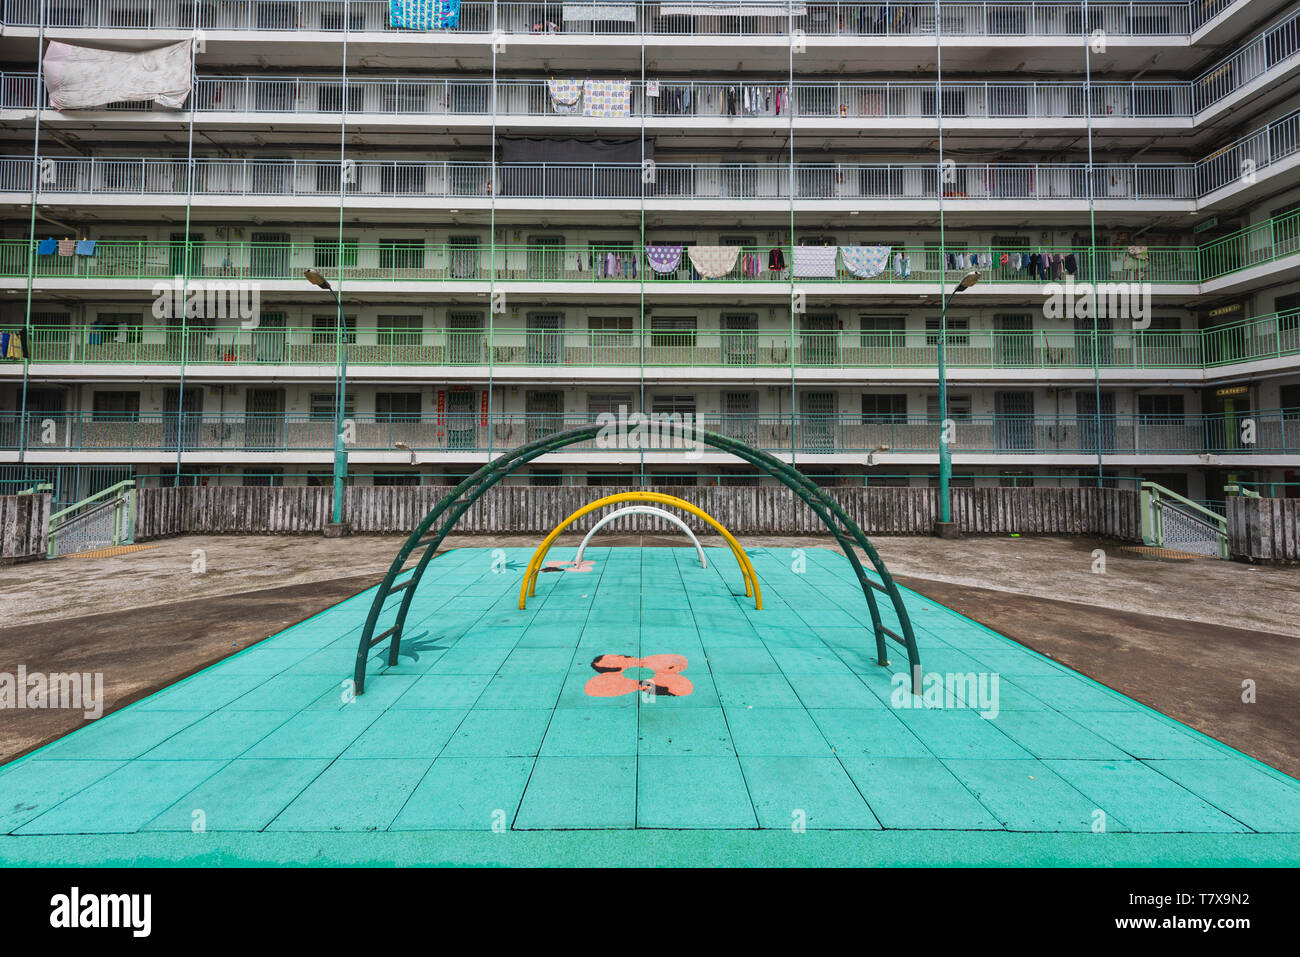 Public Housing in Hong Kong, China. - Stock Image